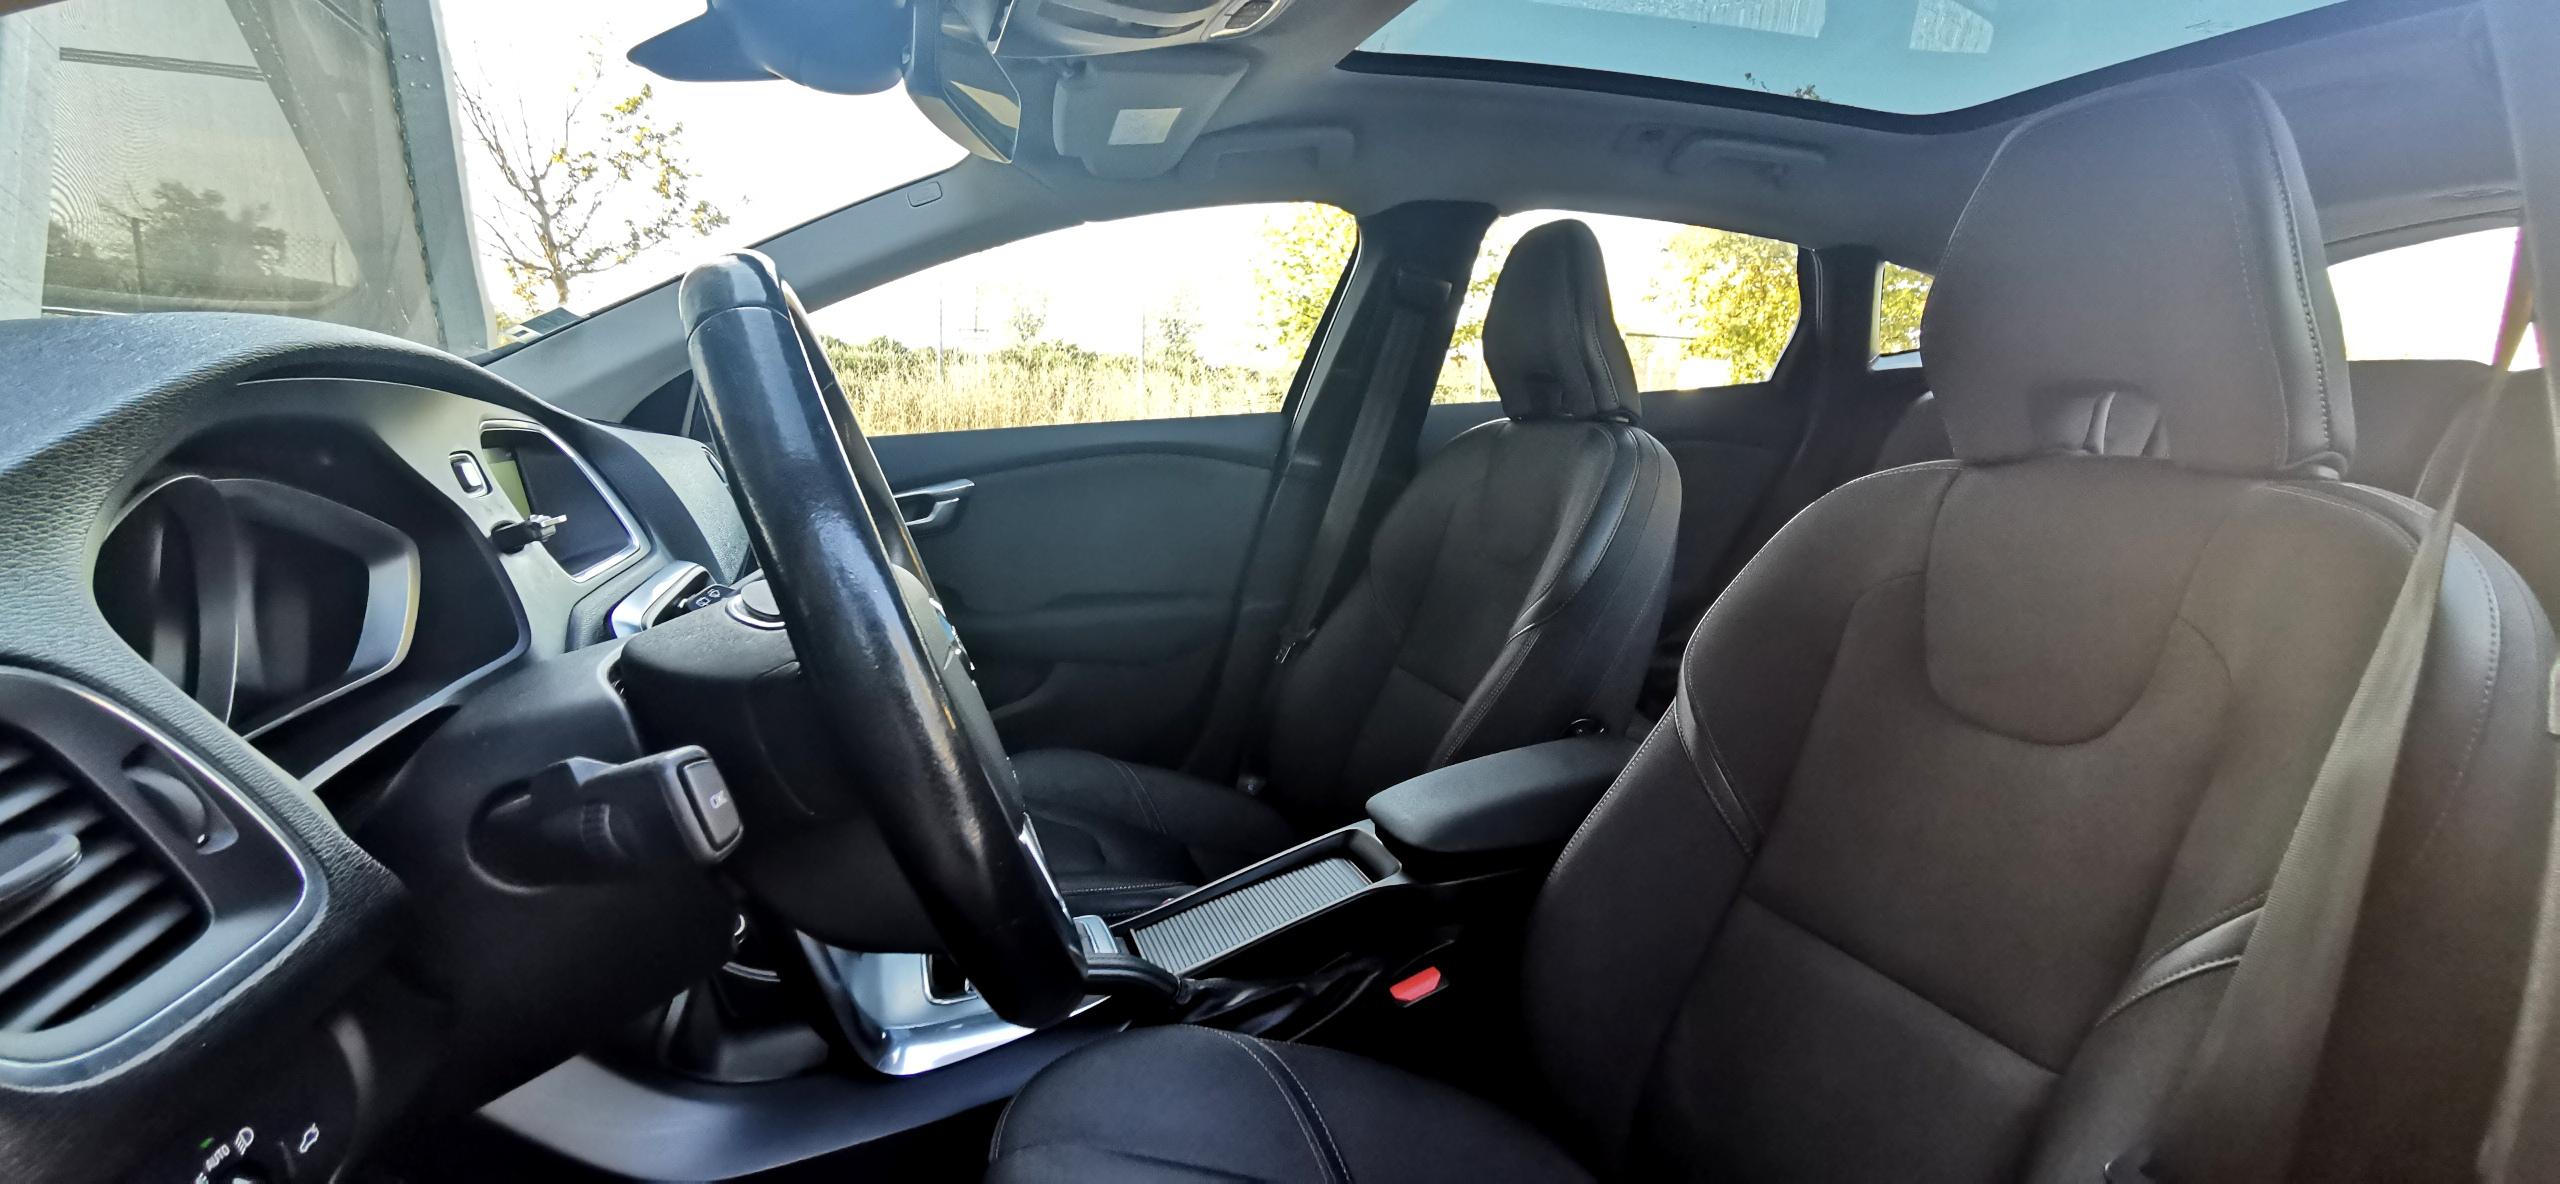 Ellak Auto Sud - Volvo V40